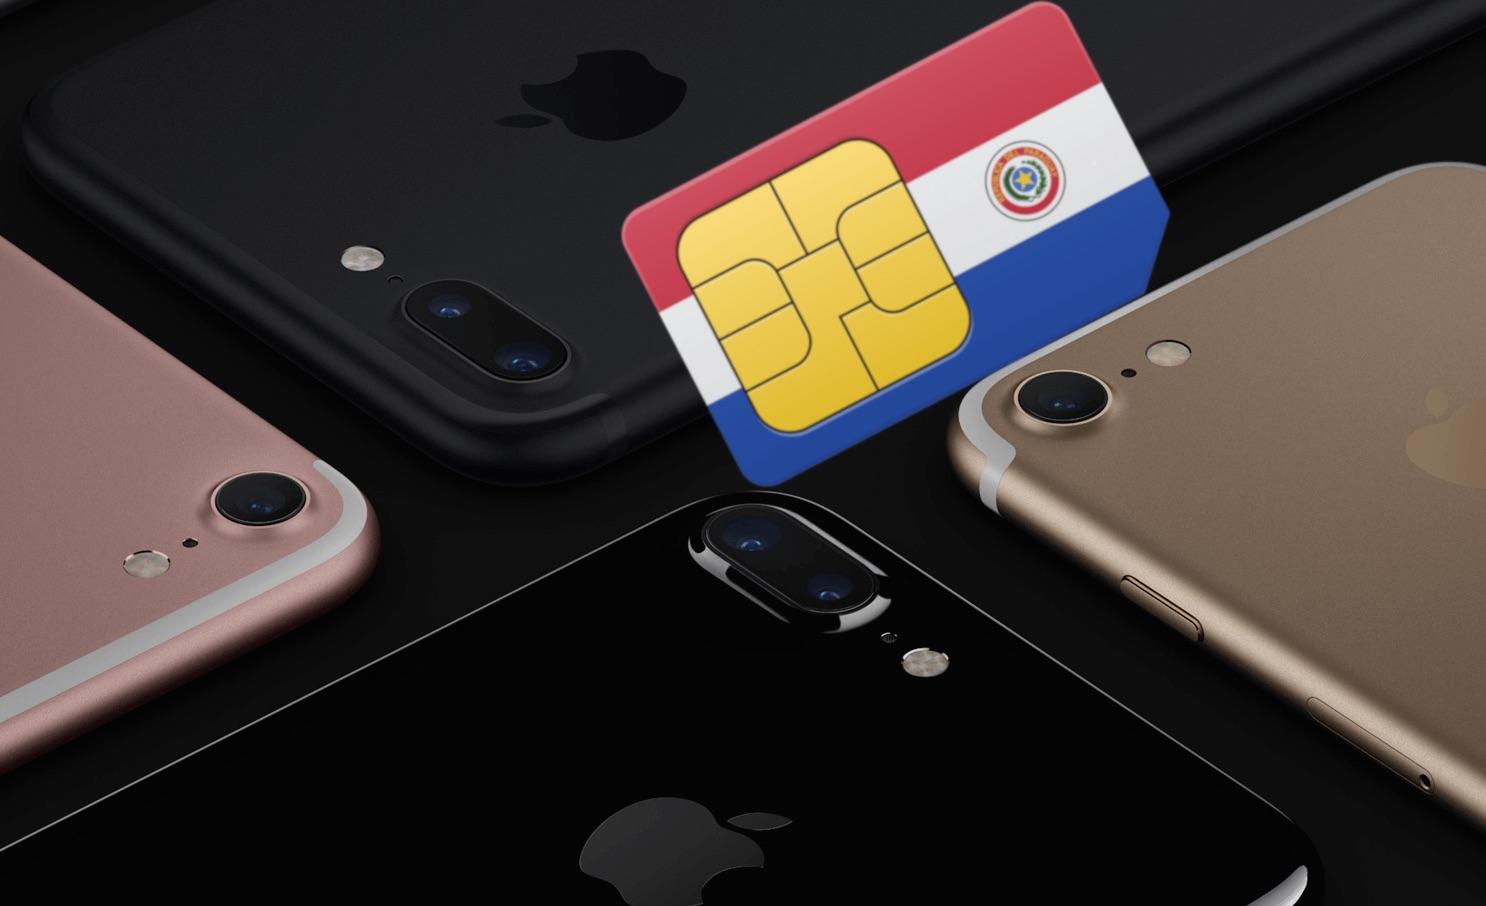 2171bdb0109 Comprar iPhone no Paraguai: O Guia Definitivo - Blog do Compras Paraguai